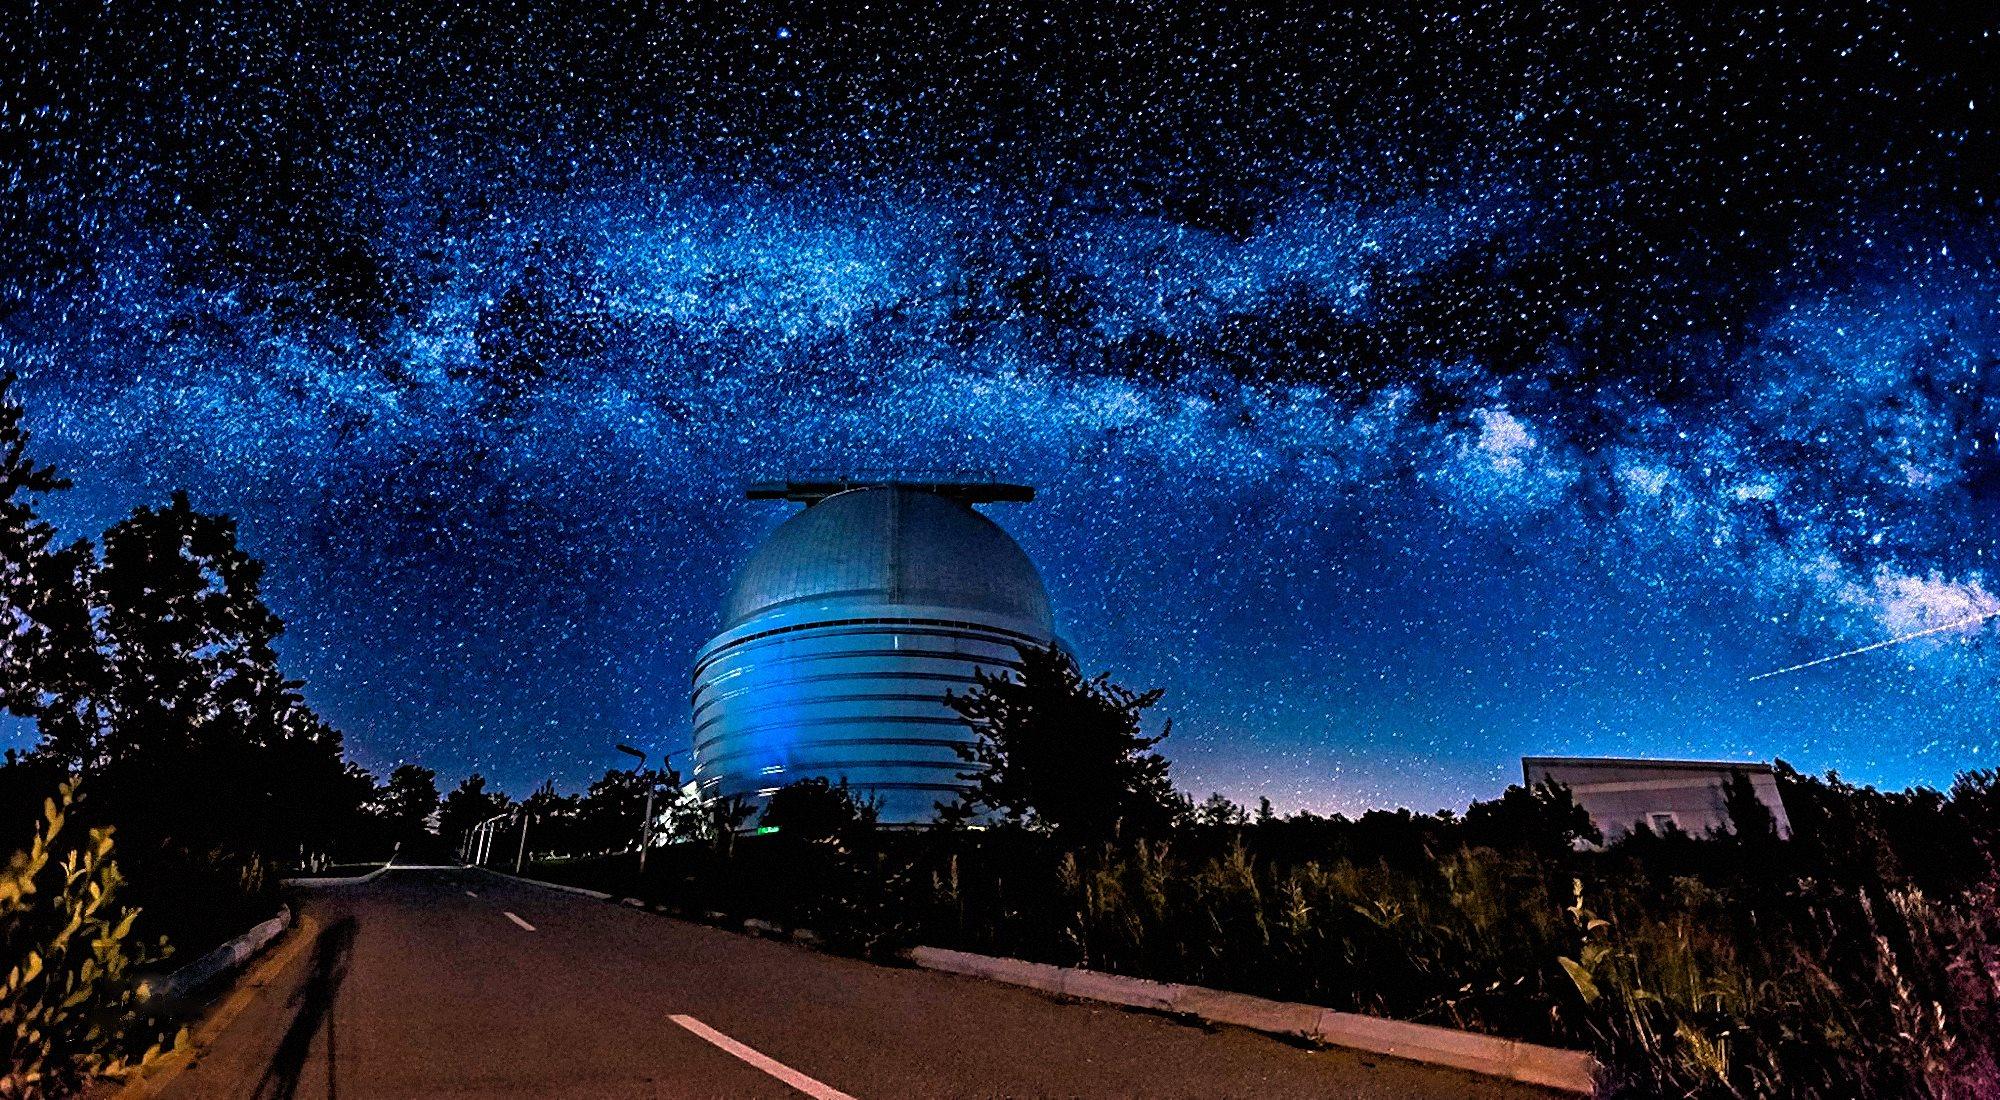 00 Faik Nagiyev. The Milky Way Over Nasreddin Tusi Shamakhi Astrophysical Observatory (ShAO) in Azerbaijan. 2016